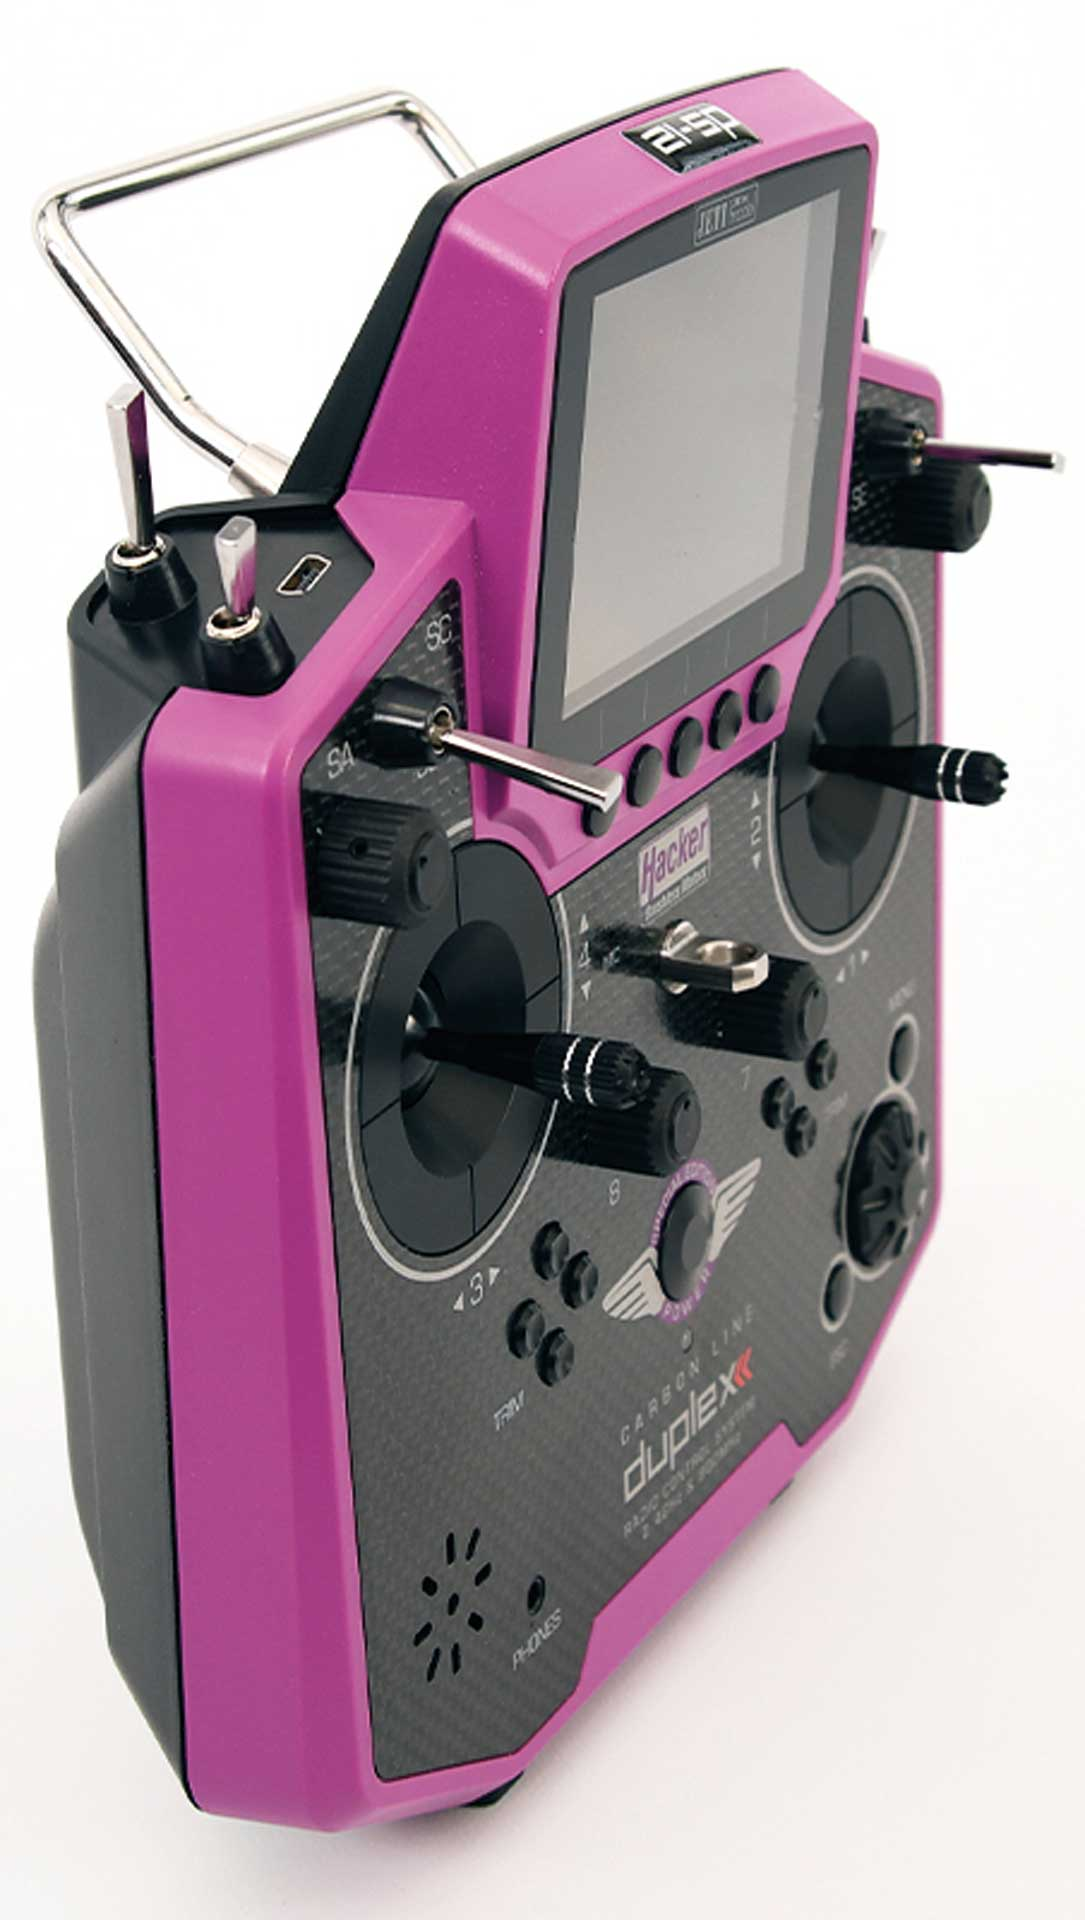 JETI DS-12 Duplex Handsender Special Edition Carbon Purple Multimode